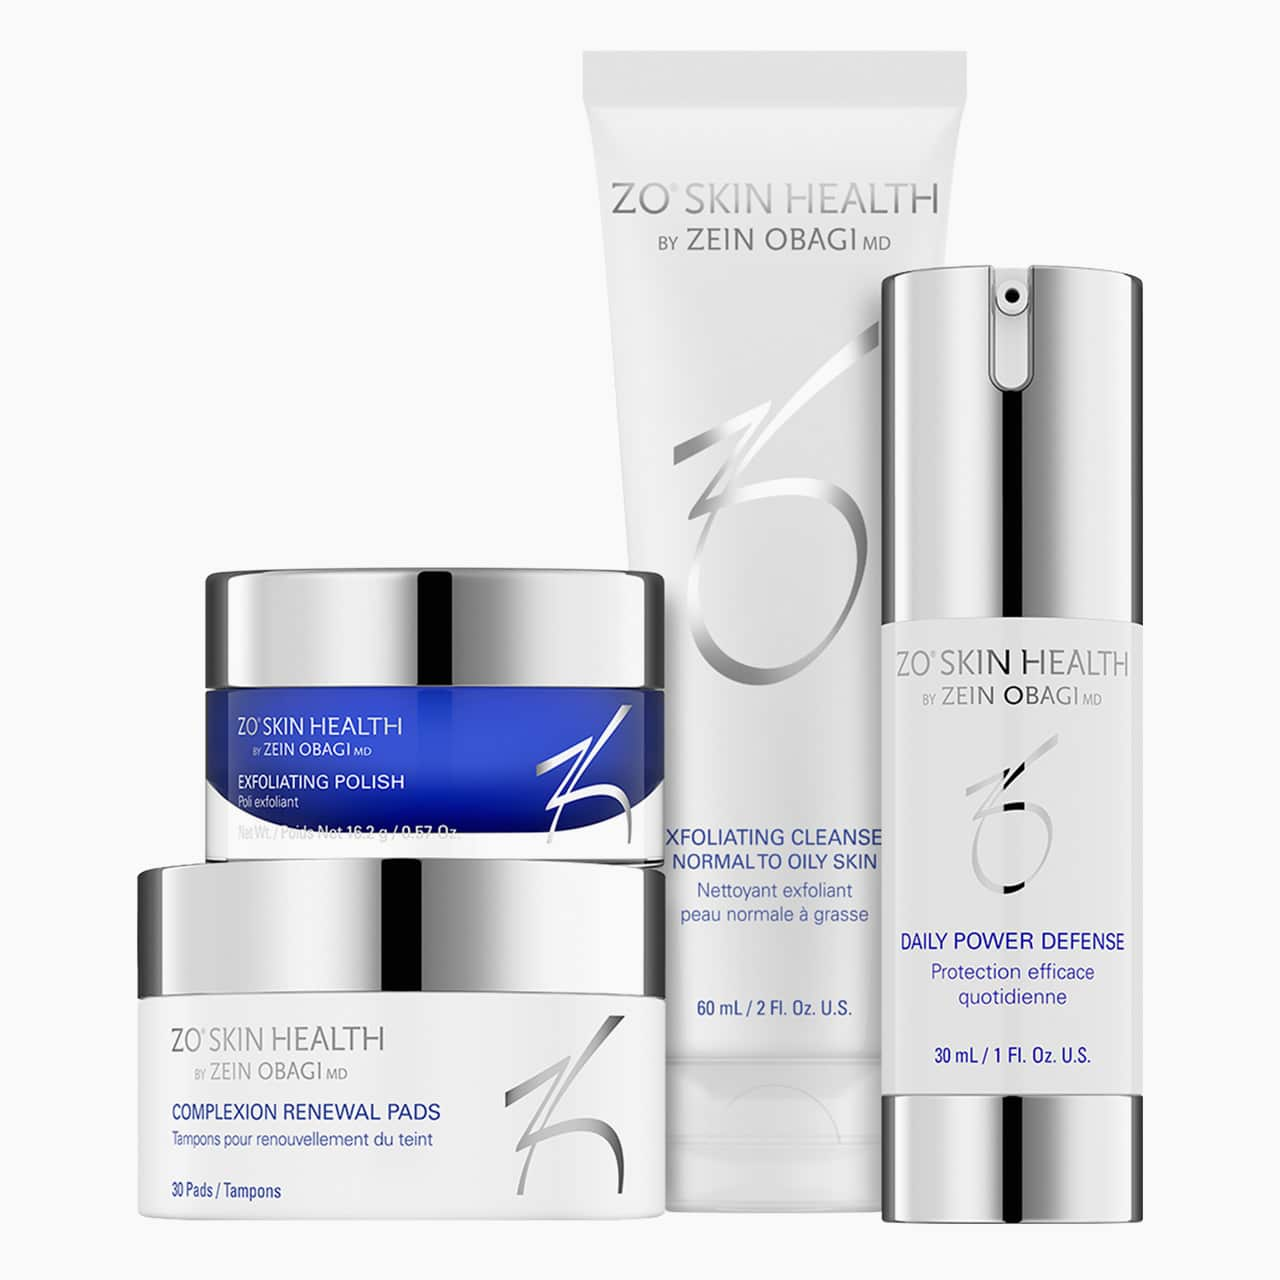 ZO Skin Health Phase 1 Daily Skincare Program